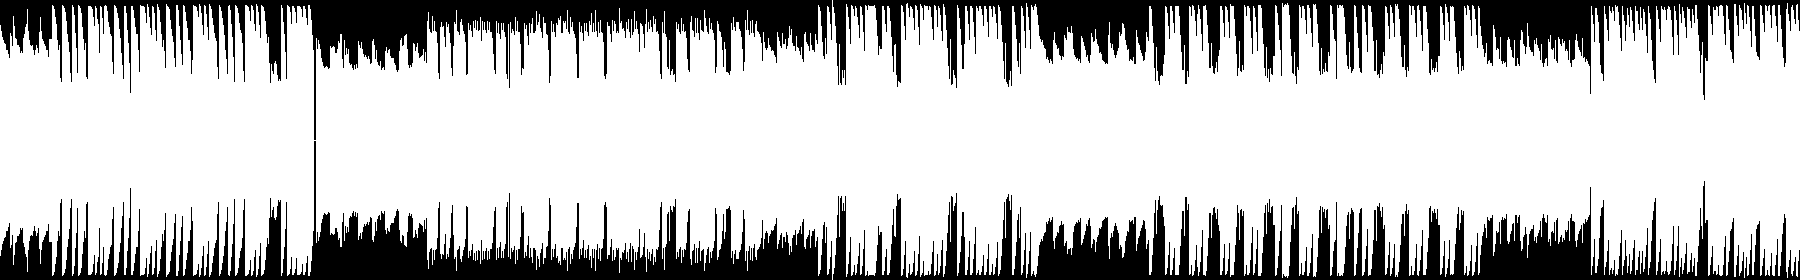 Lavish audio waveform